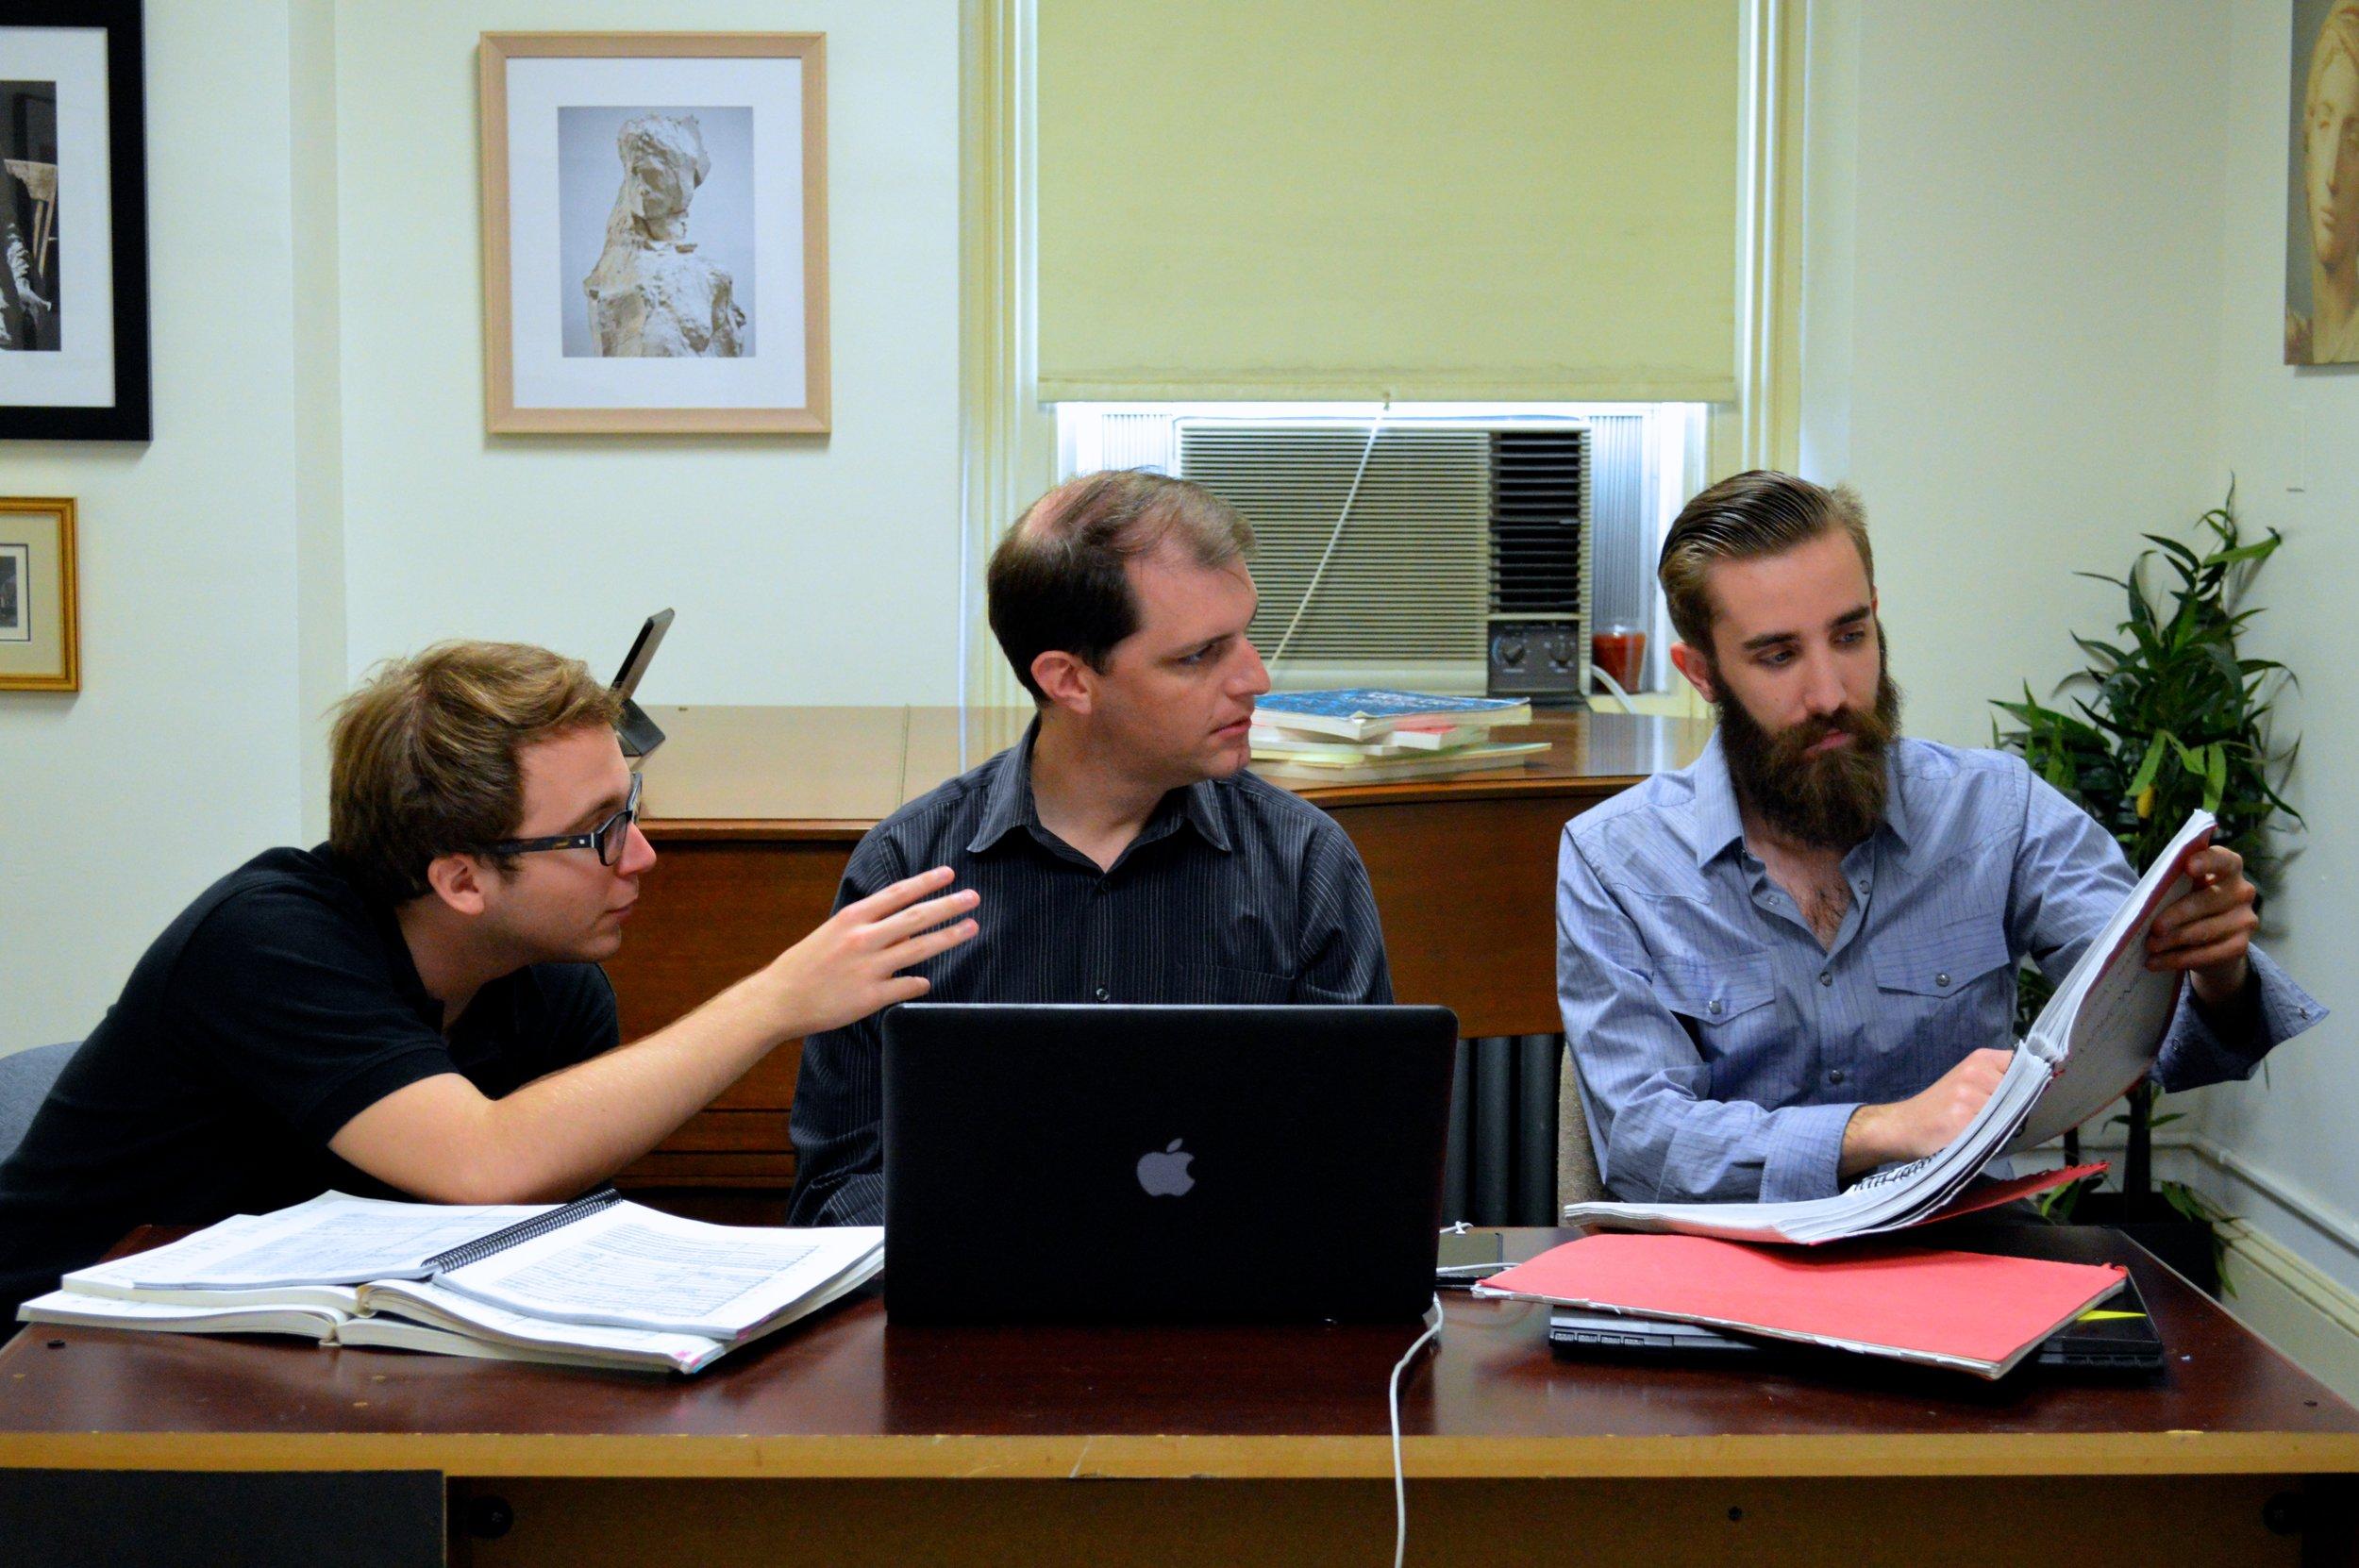 Nicholas Bentz with Jordan Randall Smith and Christopher Ciampoli